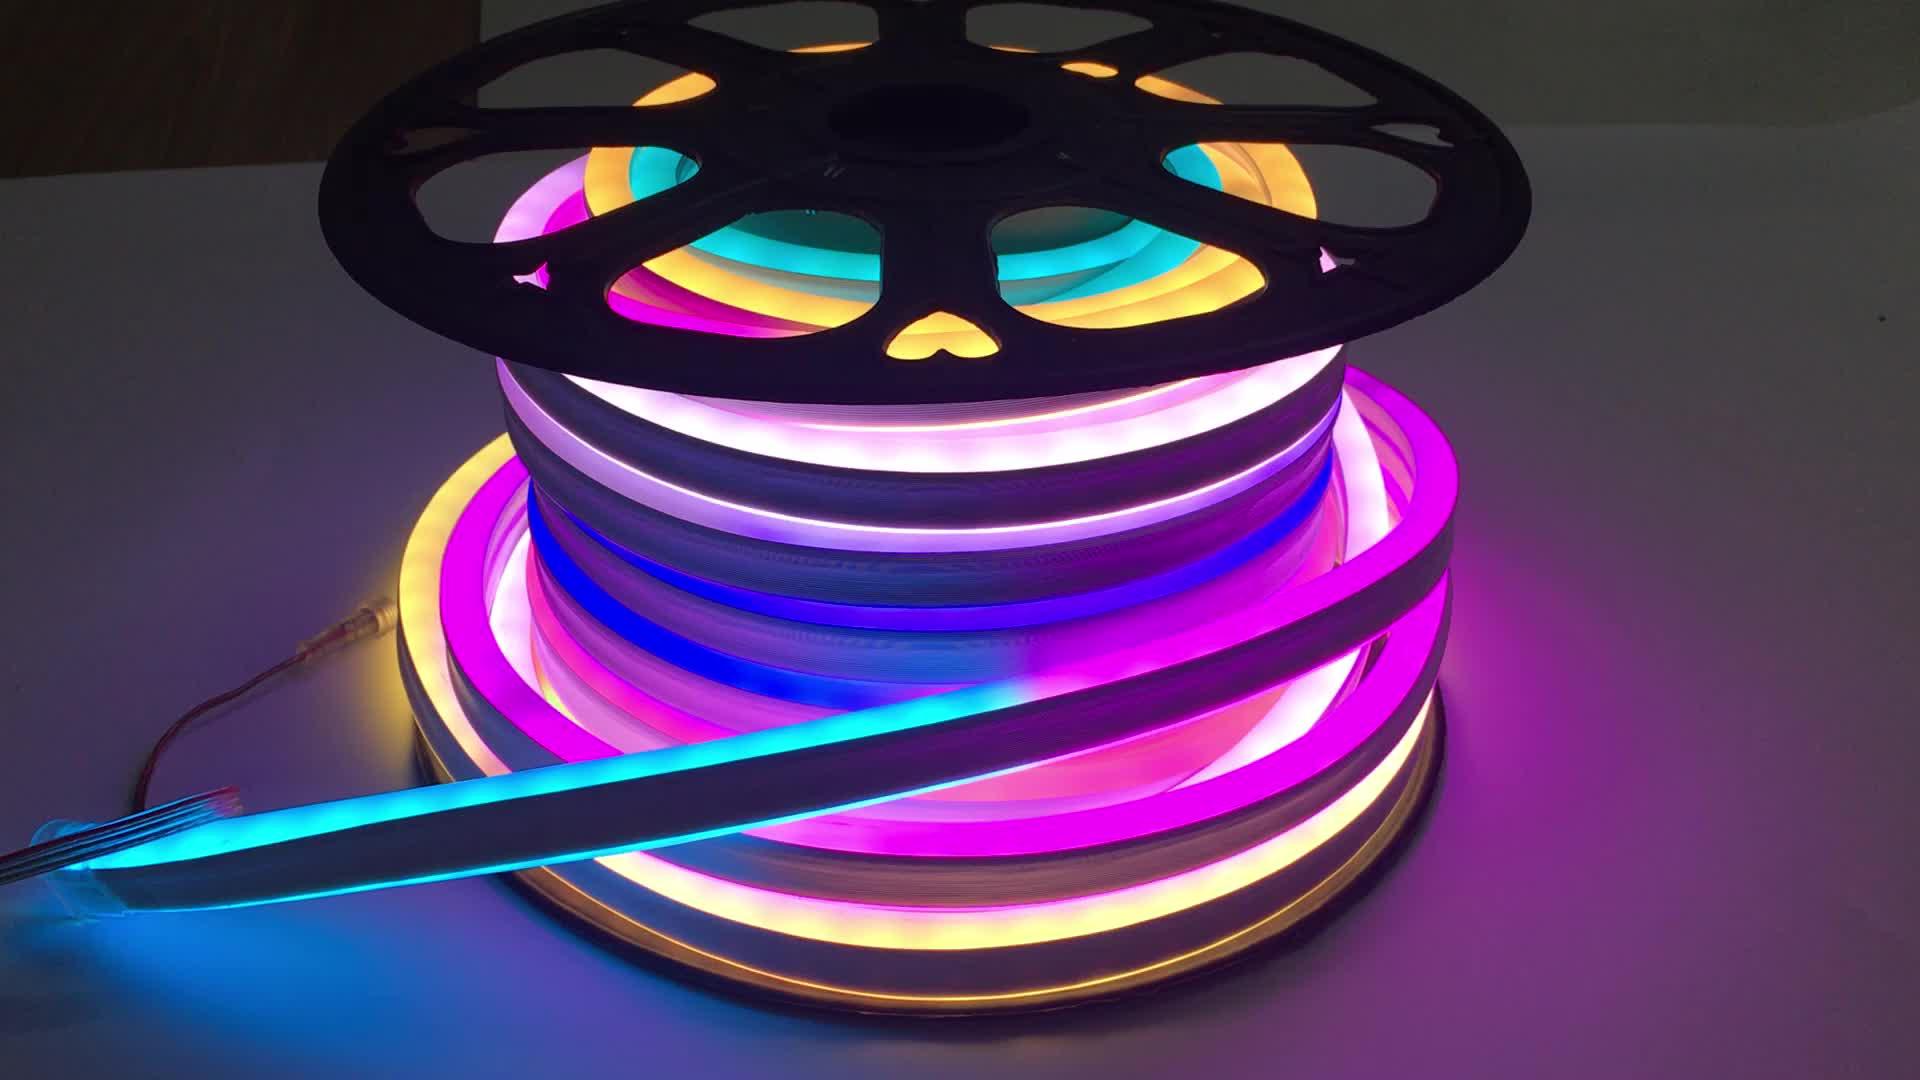 DC12V/24V 5050 RGB 60Pixel Digital Silicone Flat Neon Lamp